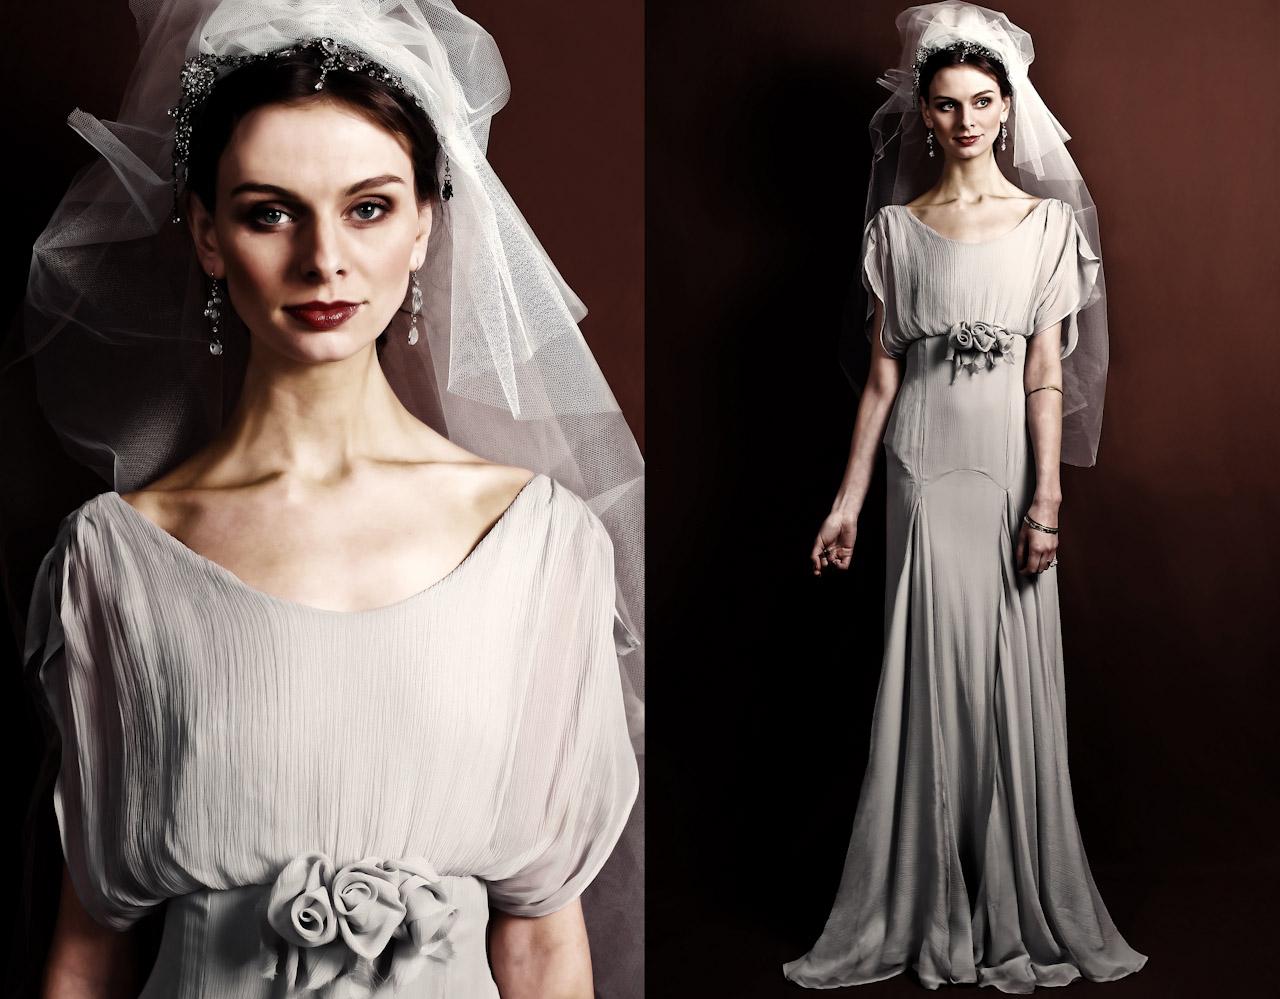 vintage inspired dresses vintage inspired wedding dresses for classic wedding | wedding sunny TNZNRLW